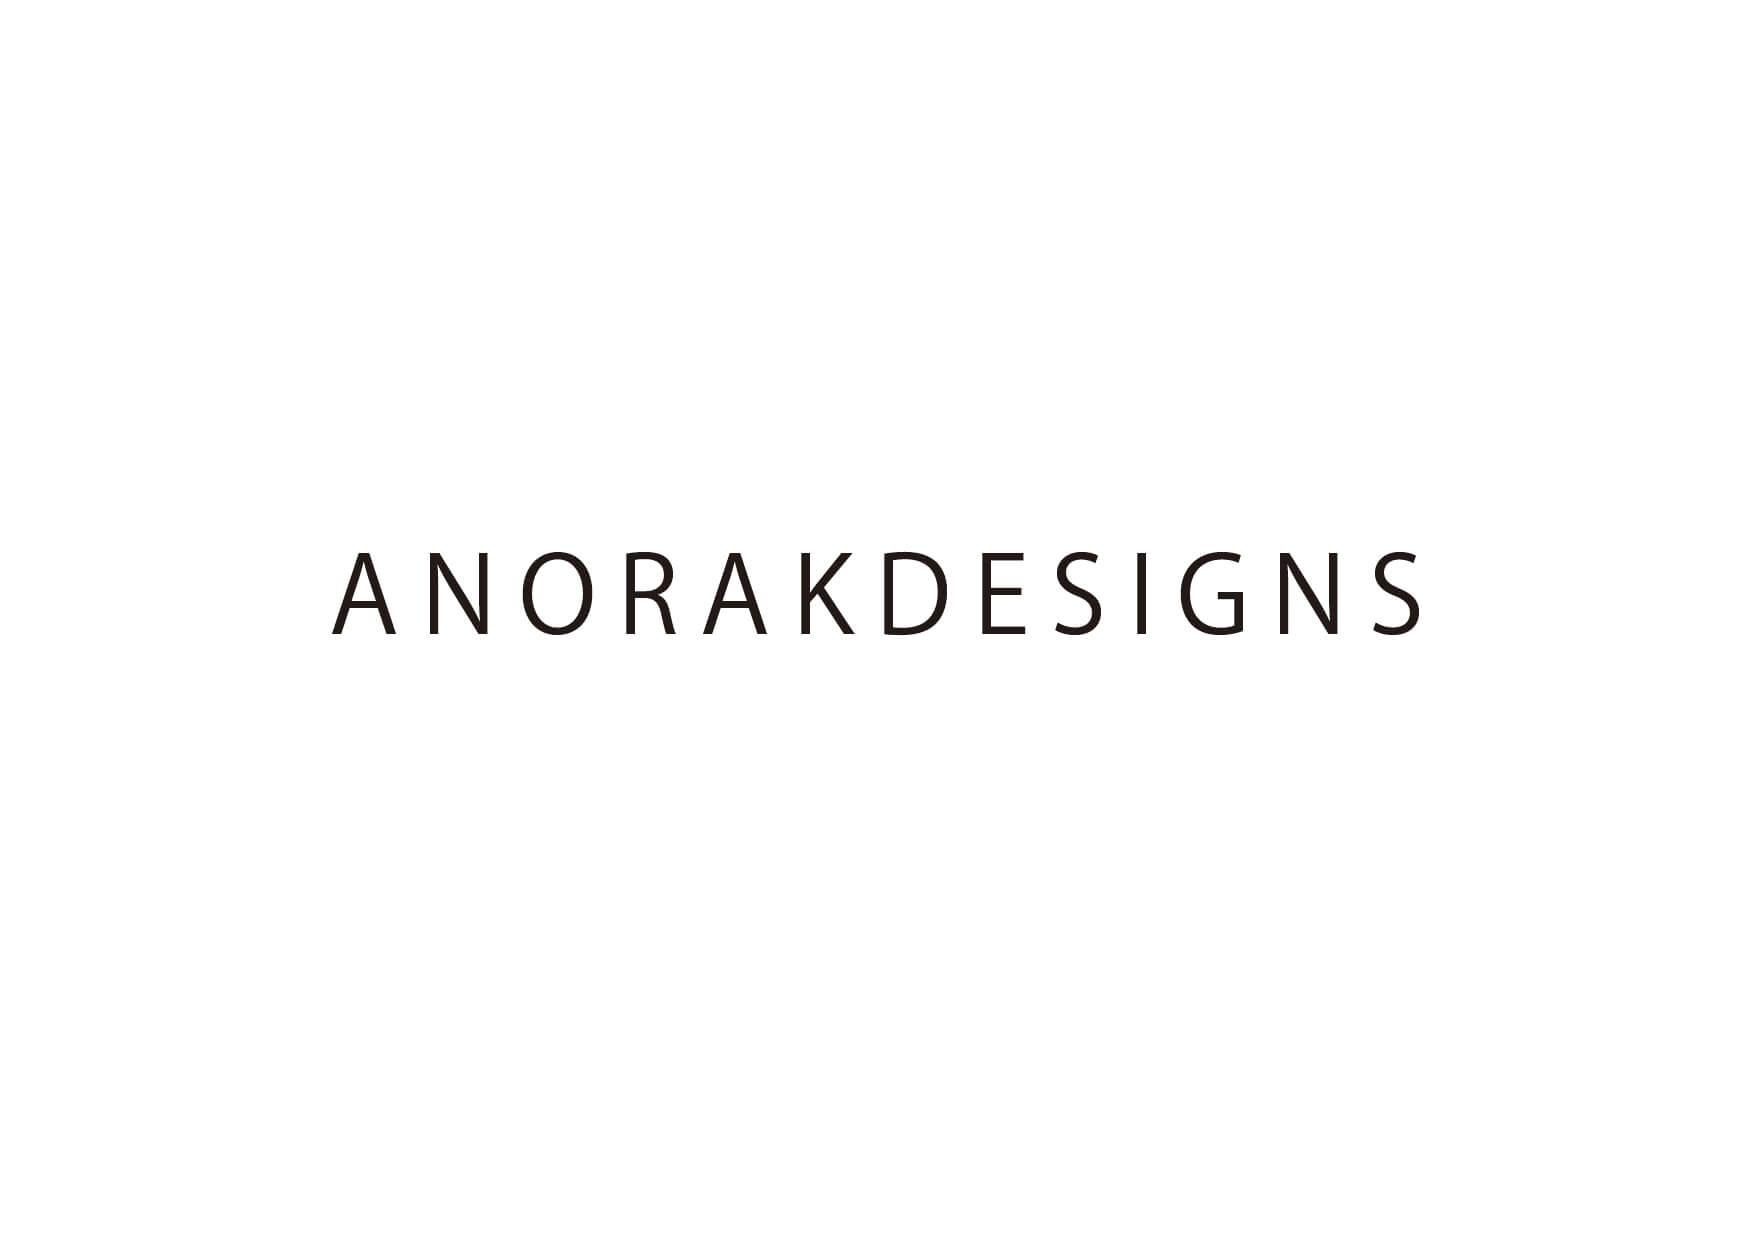 ANORAKDESIGNSのロゴ写真